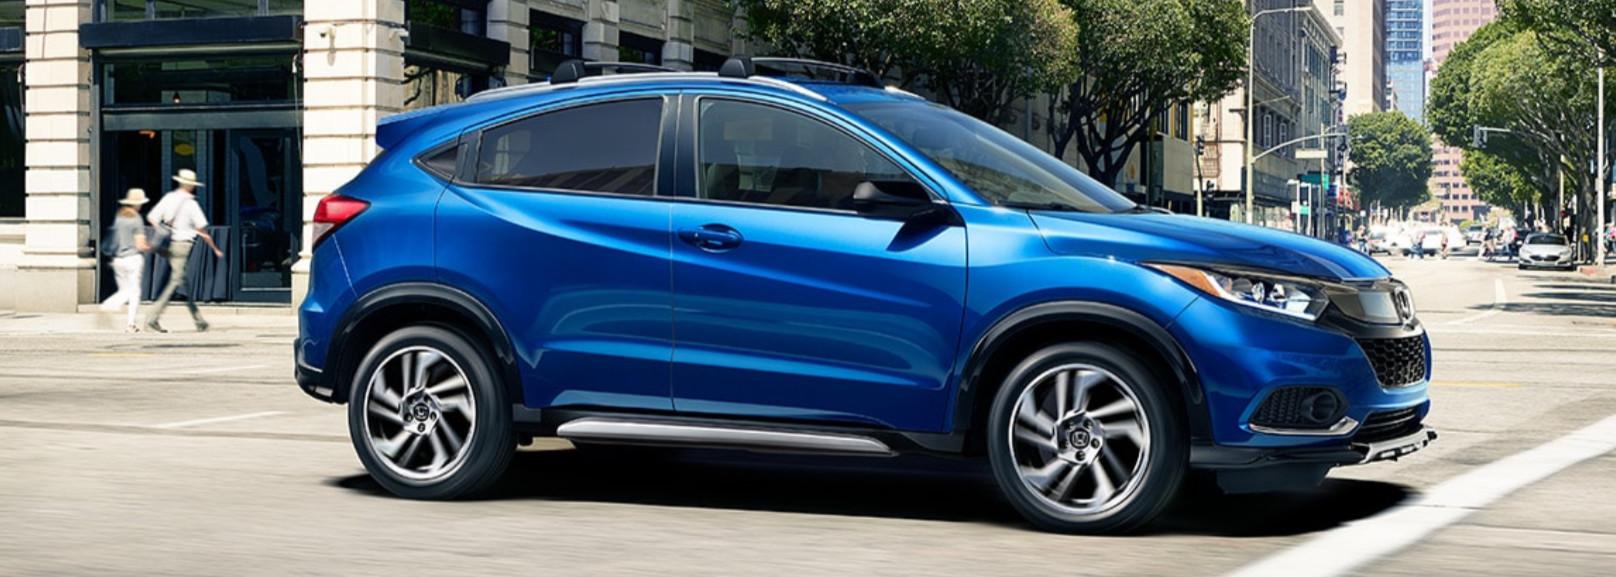 2020 Honda HR-V Leasing near The Woodlands, TX